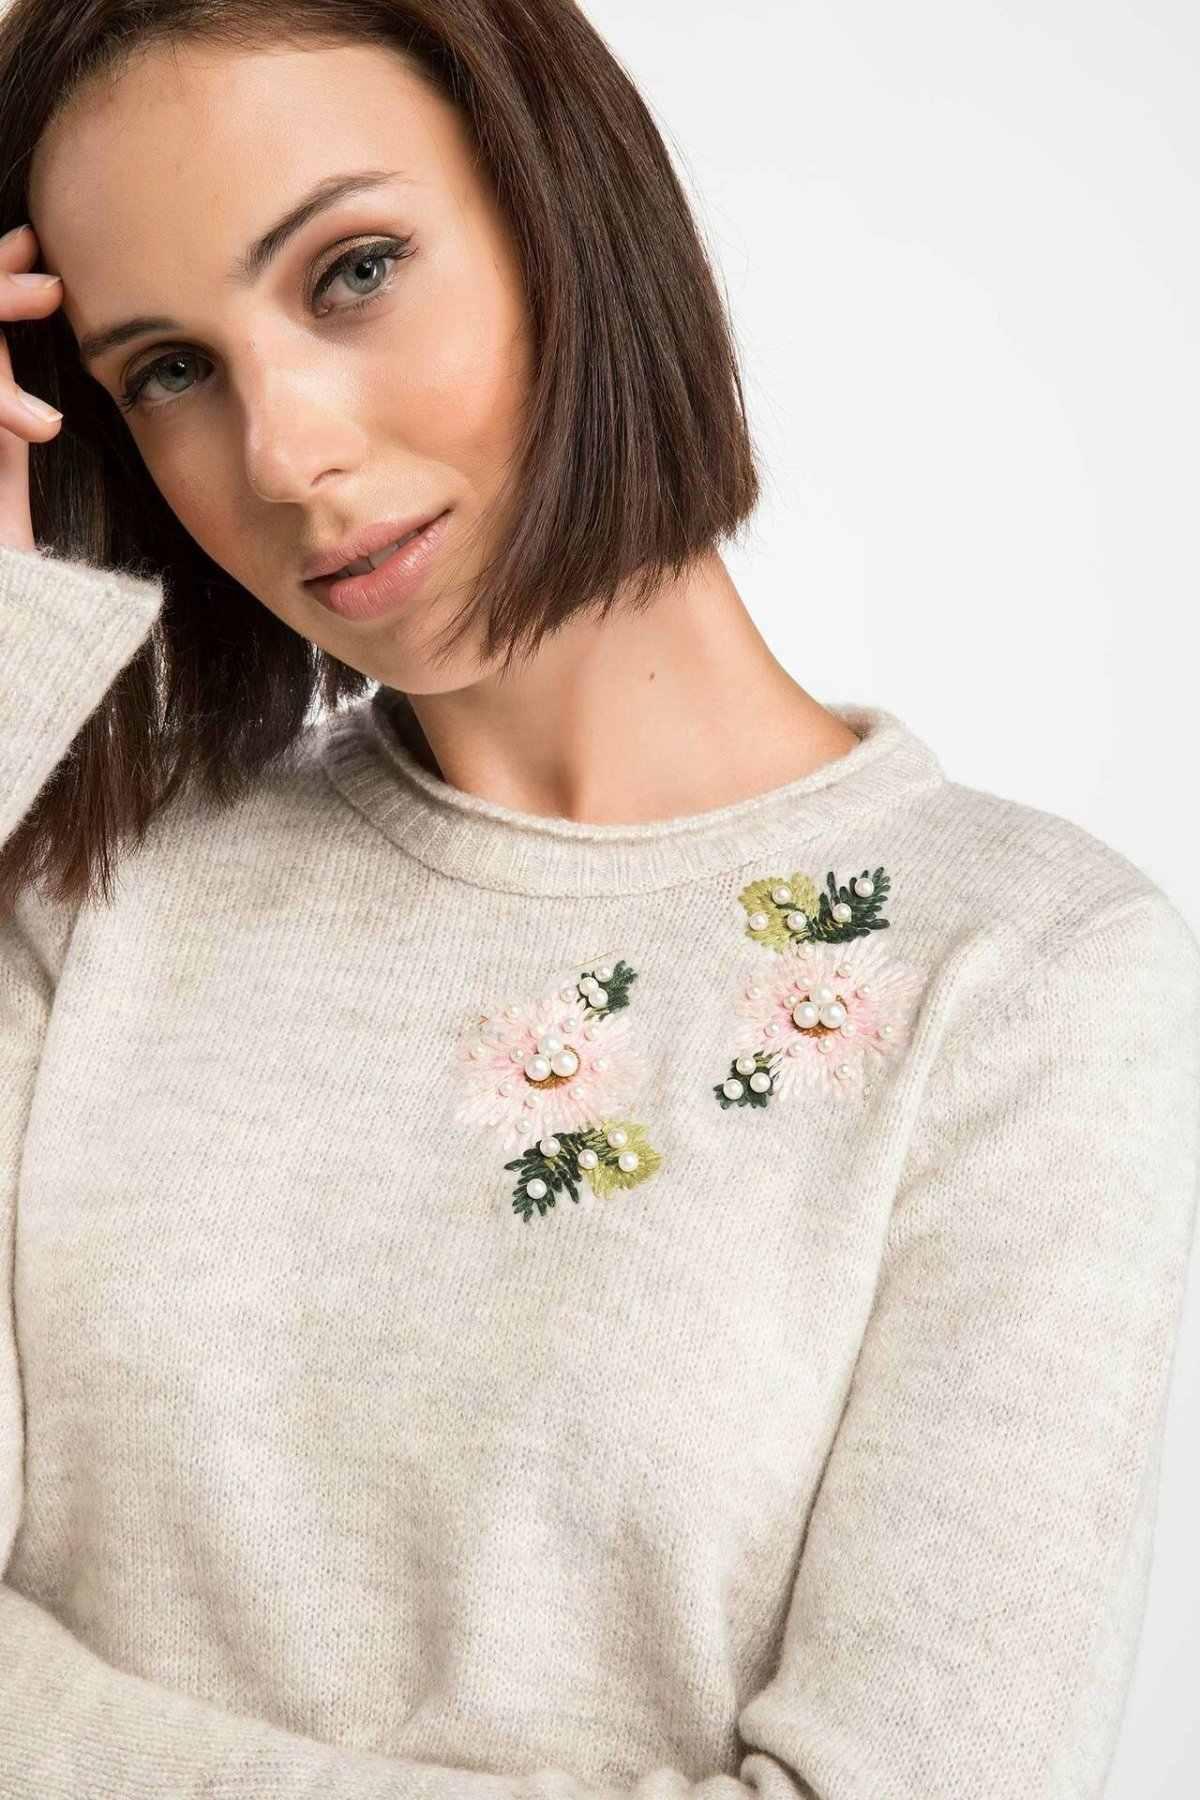 DeFacto ผู้หญิงฤดูหนาวดอกไม้ Decals สีขาว Pullover ผู้หญิงสบายๆ O-Neck TOP เสื้อหญิง Pullovers-J0532AZ18WN